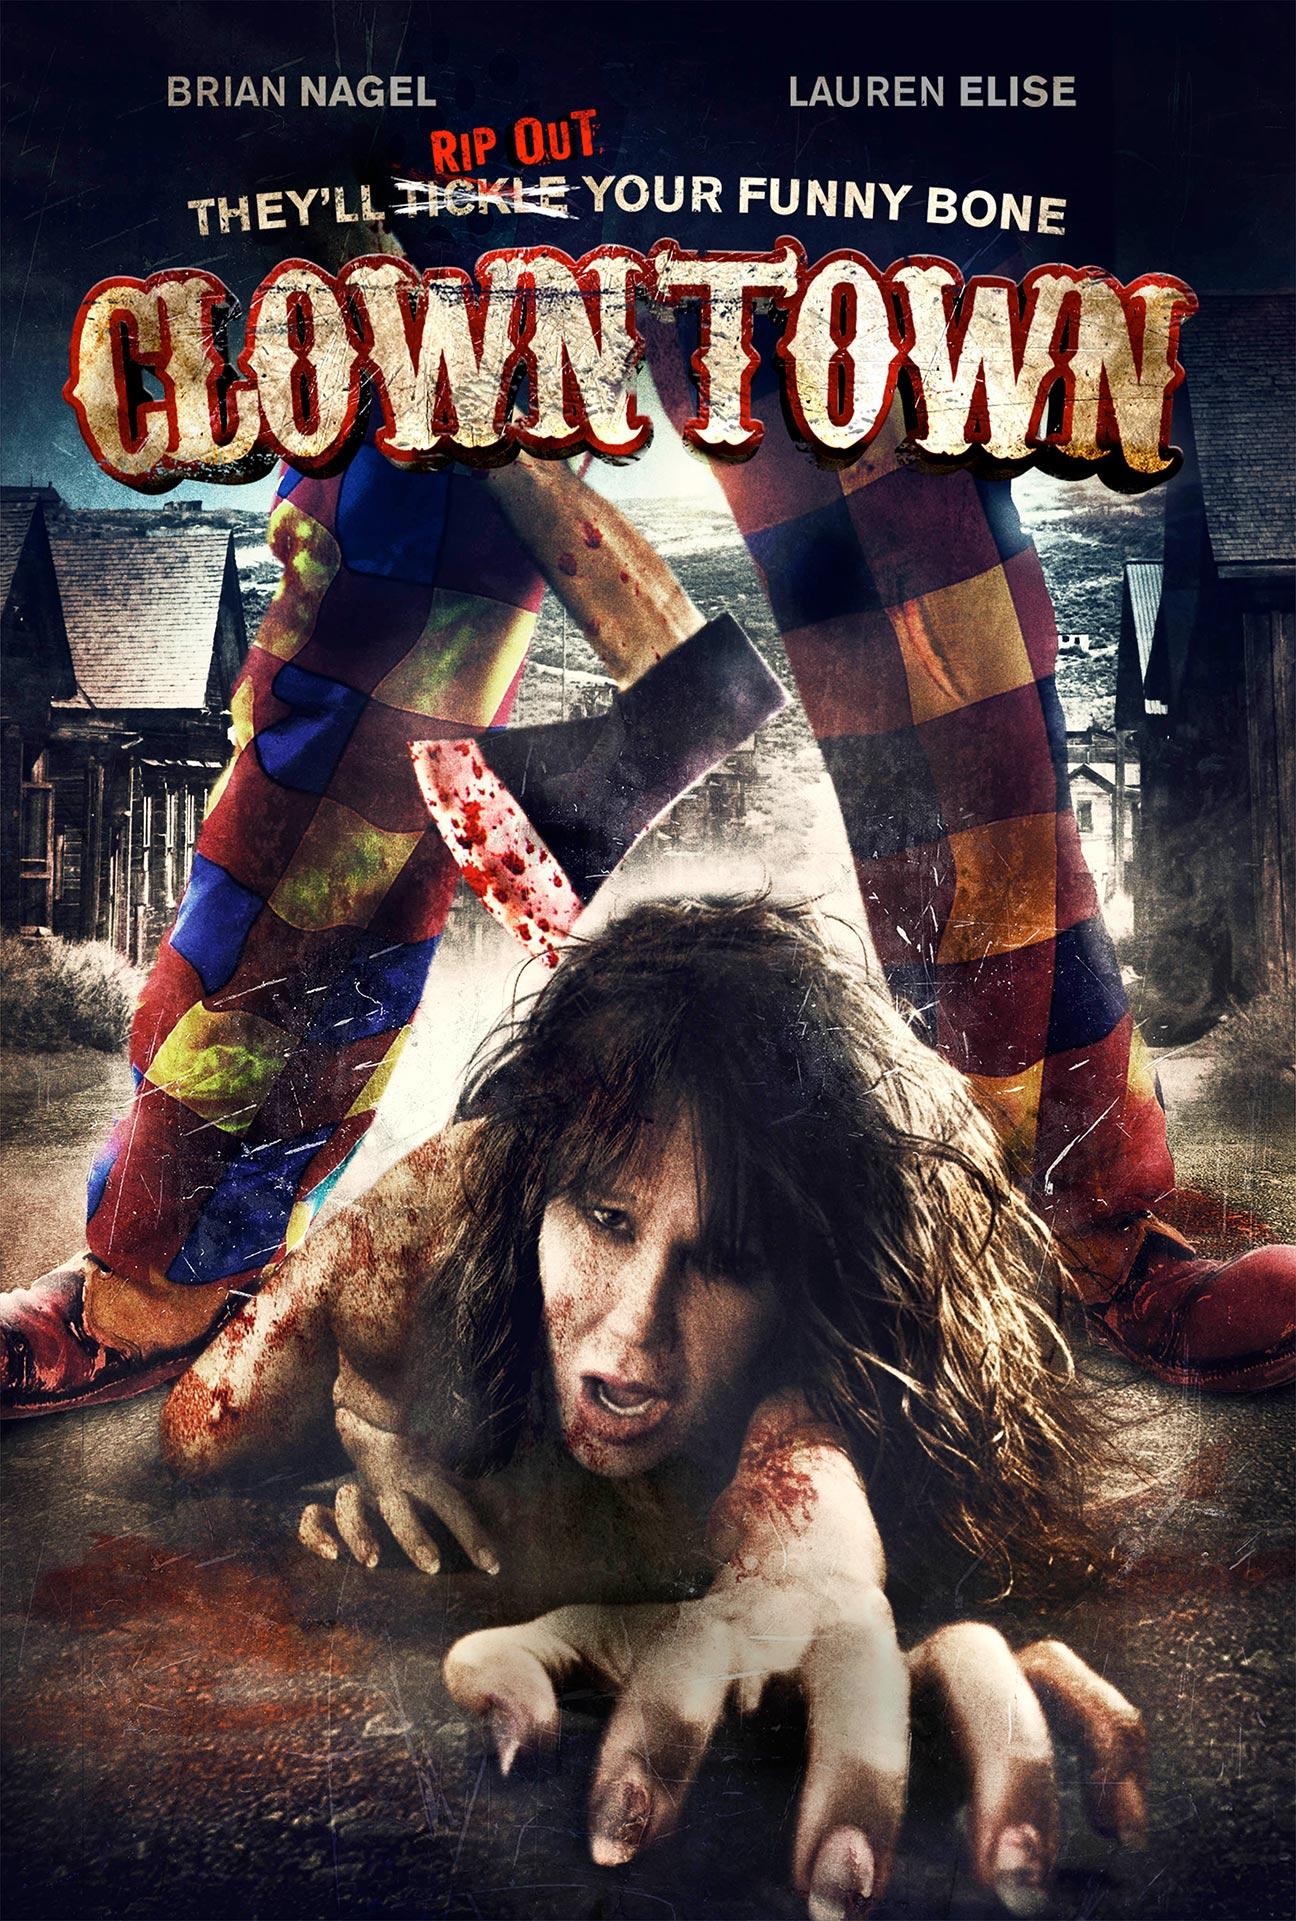 ClownTown Poster #1